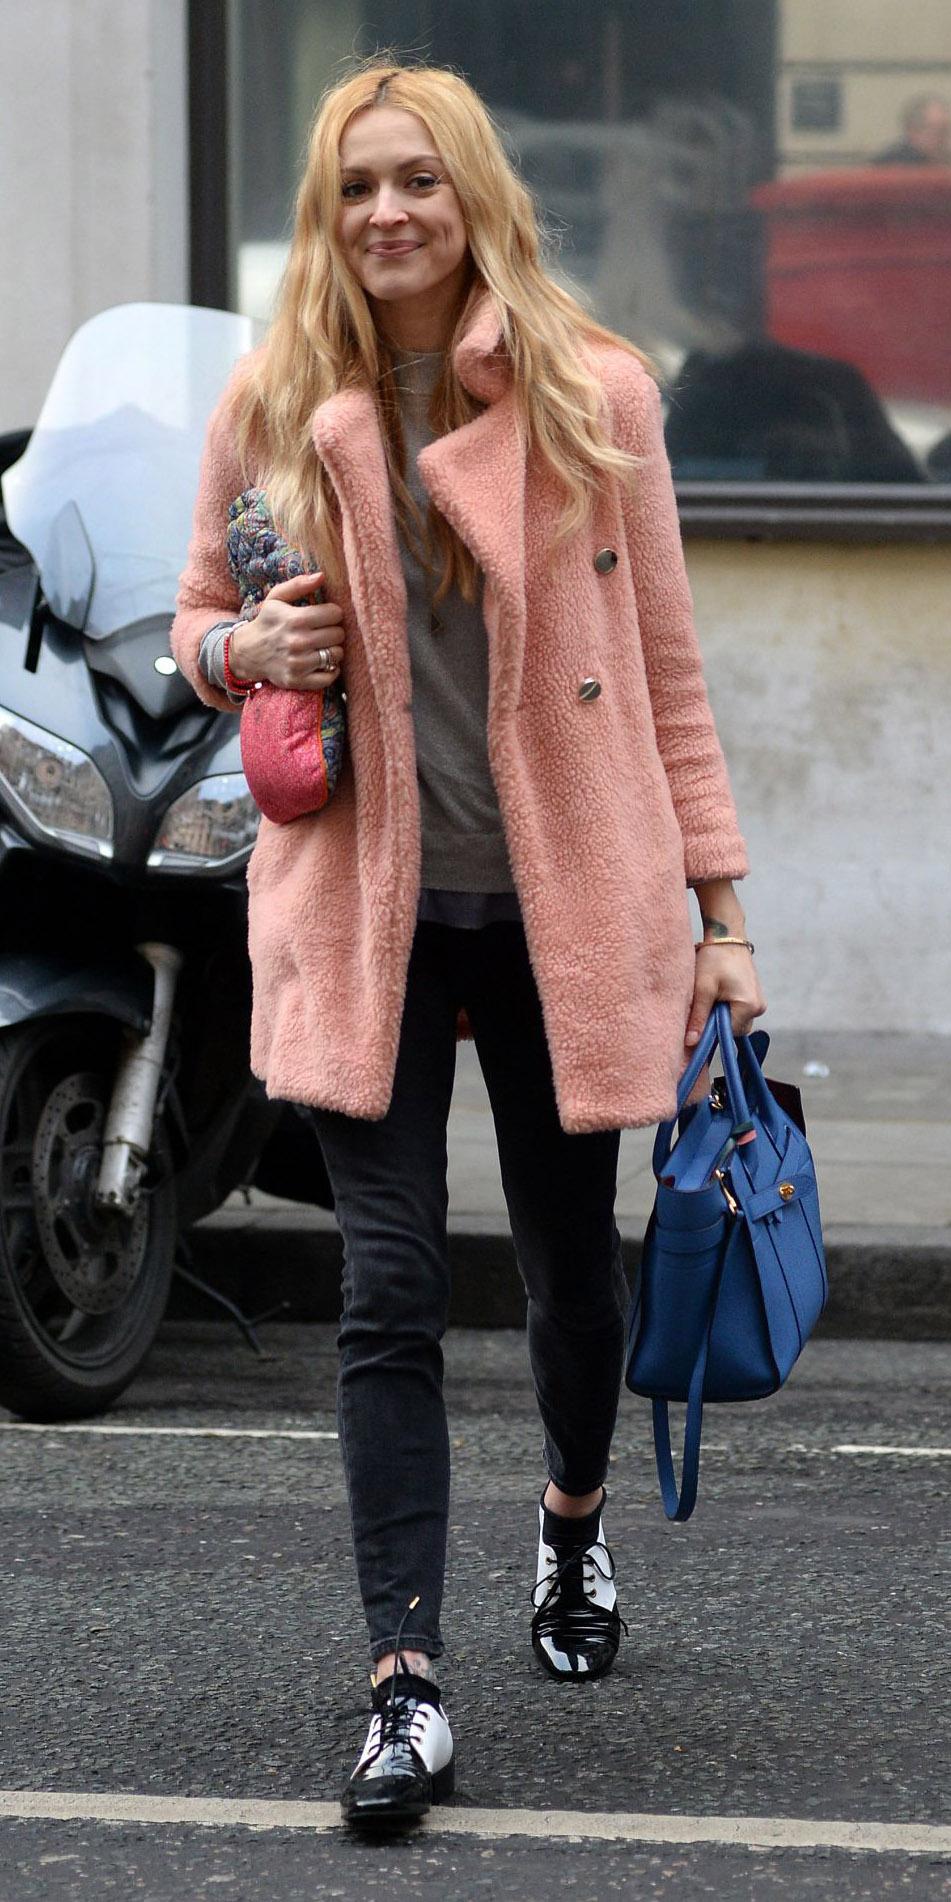 black-skinny-jeans-pink-light-jacket-coat-blue-bag-white-shoe-brogues-fearnecotton-blonde-fall-winter-lunch.jpg